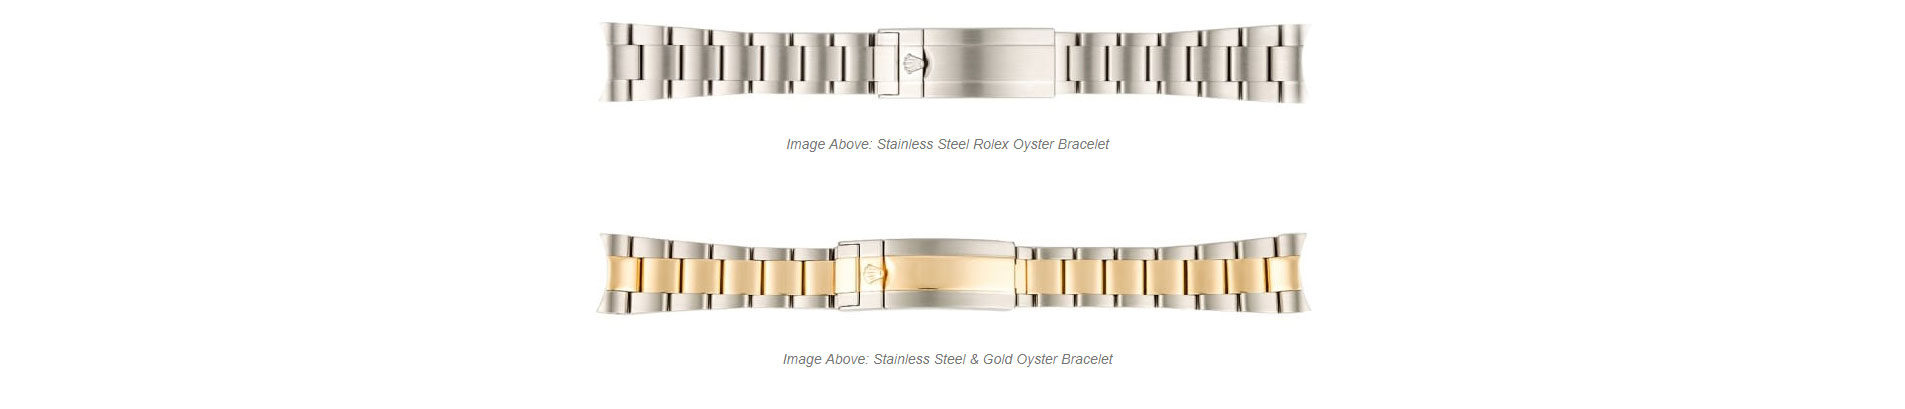 Oyster Bracelets Repair